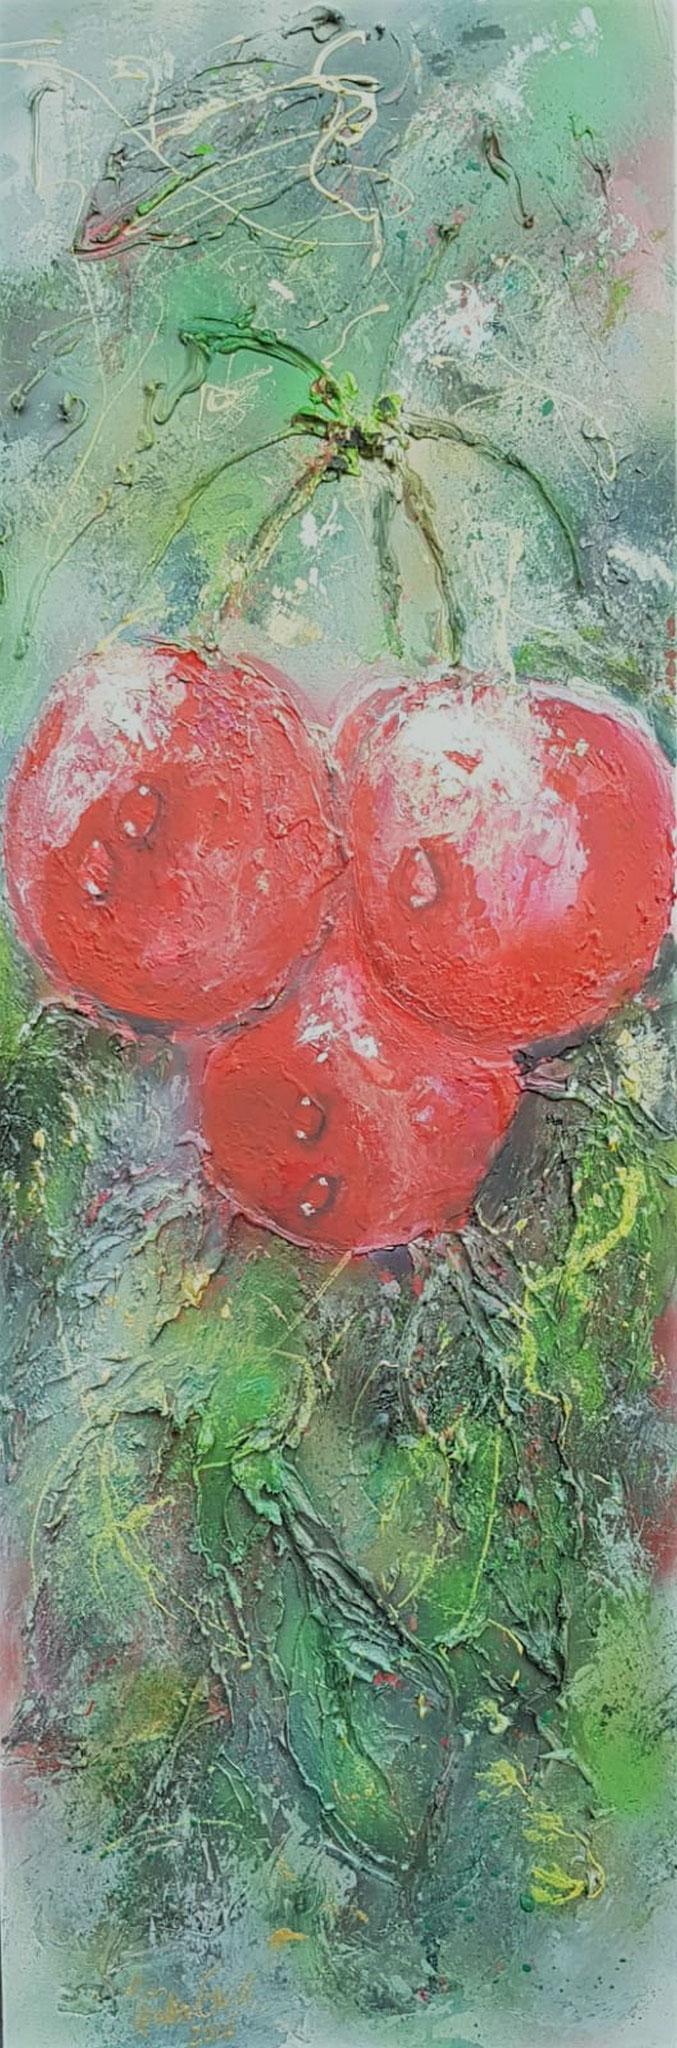 Cherry (Technik:  Acryl Mixed Media)1,20 m X 40 X 1,5 cm auf Leinwand